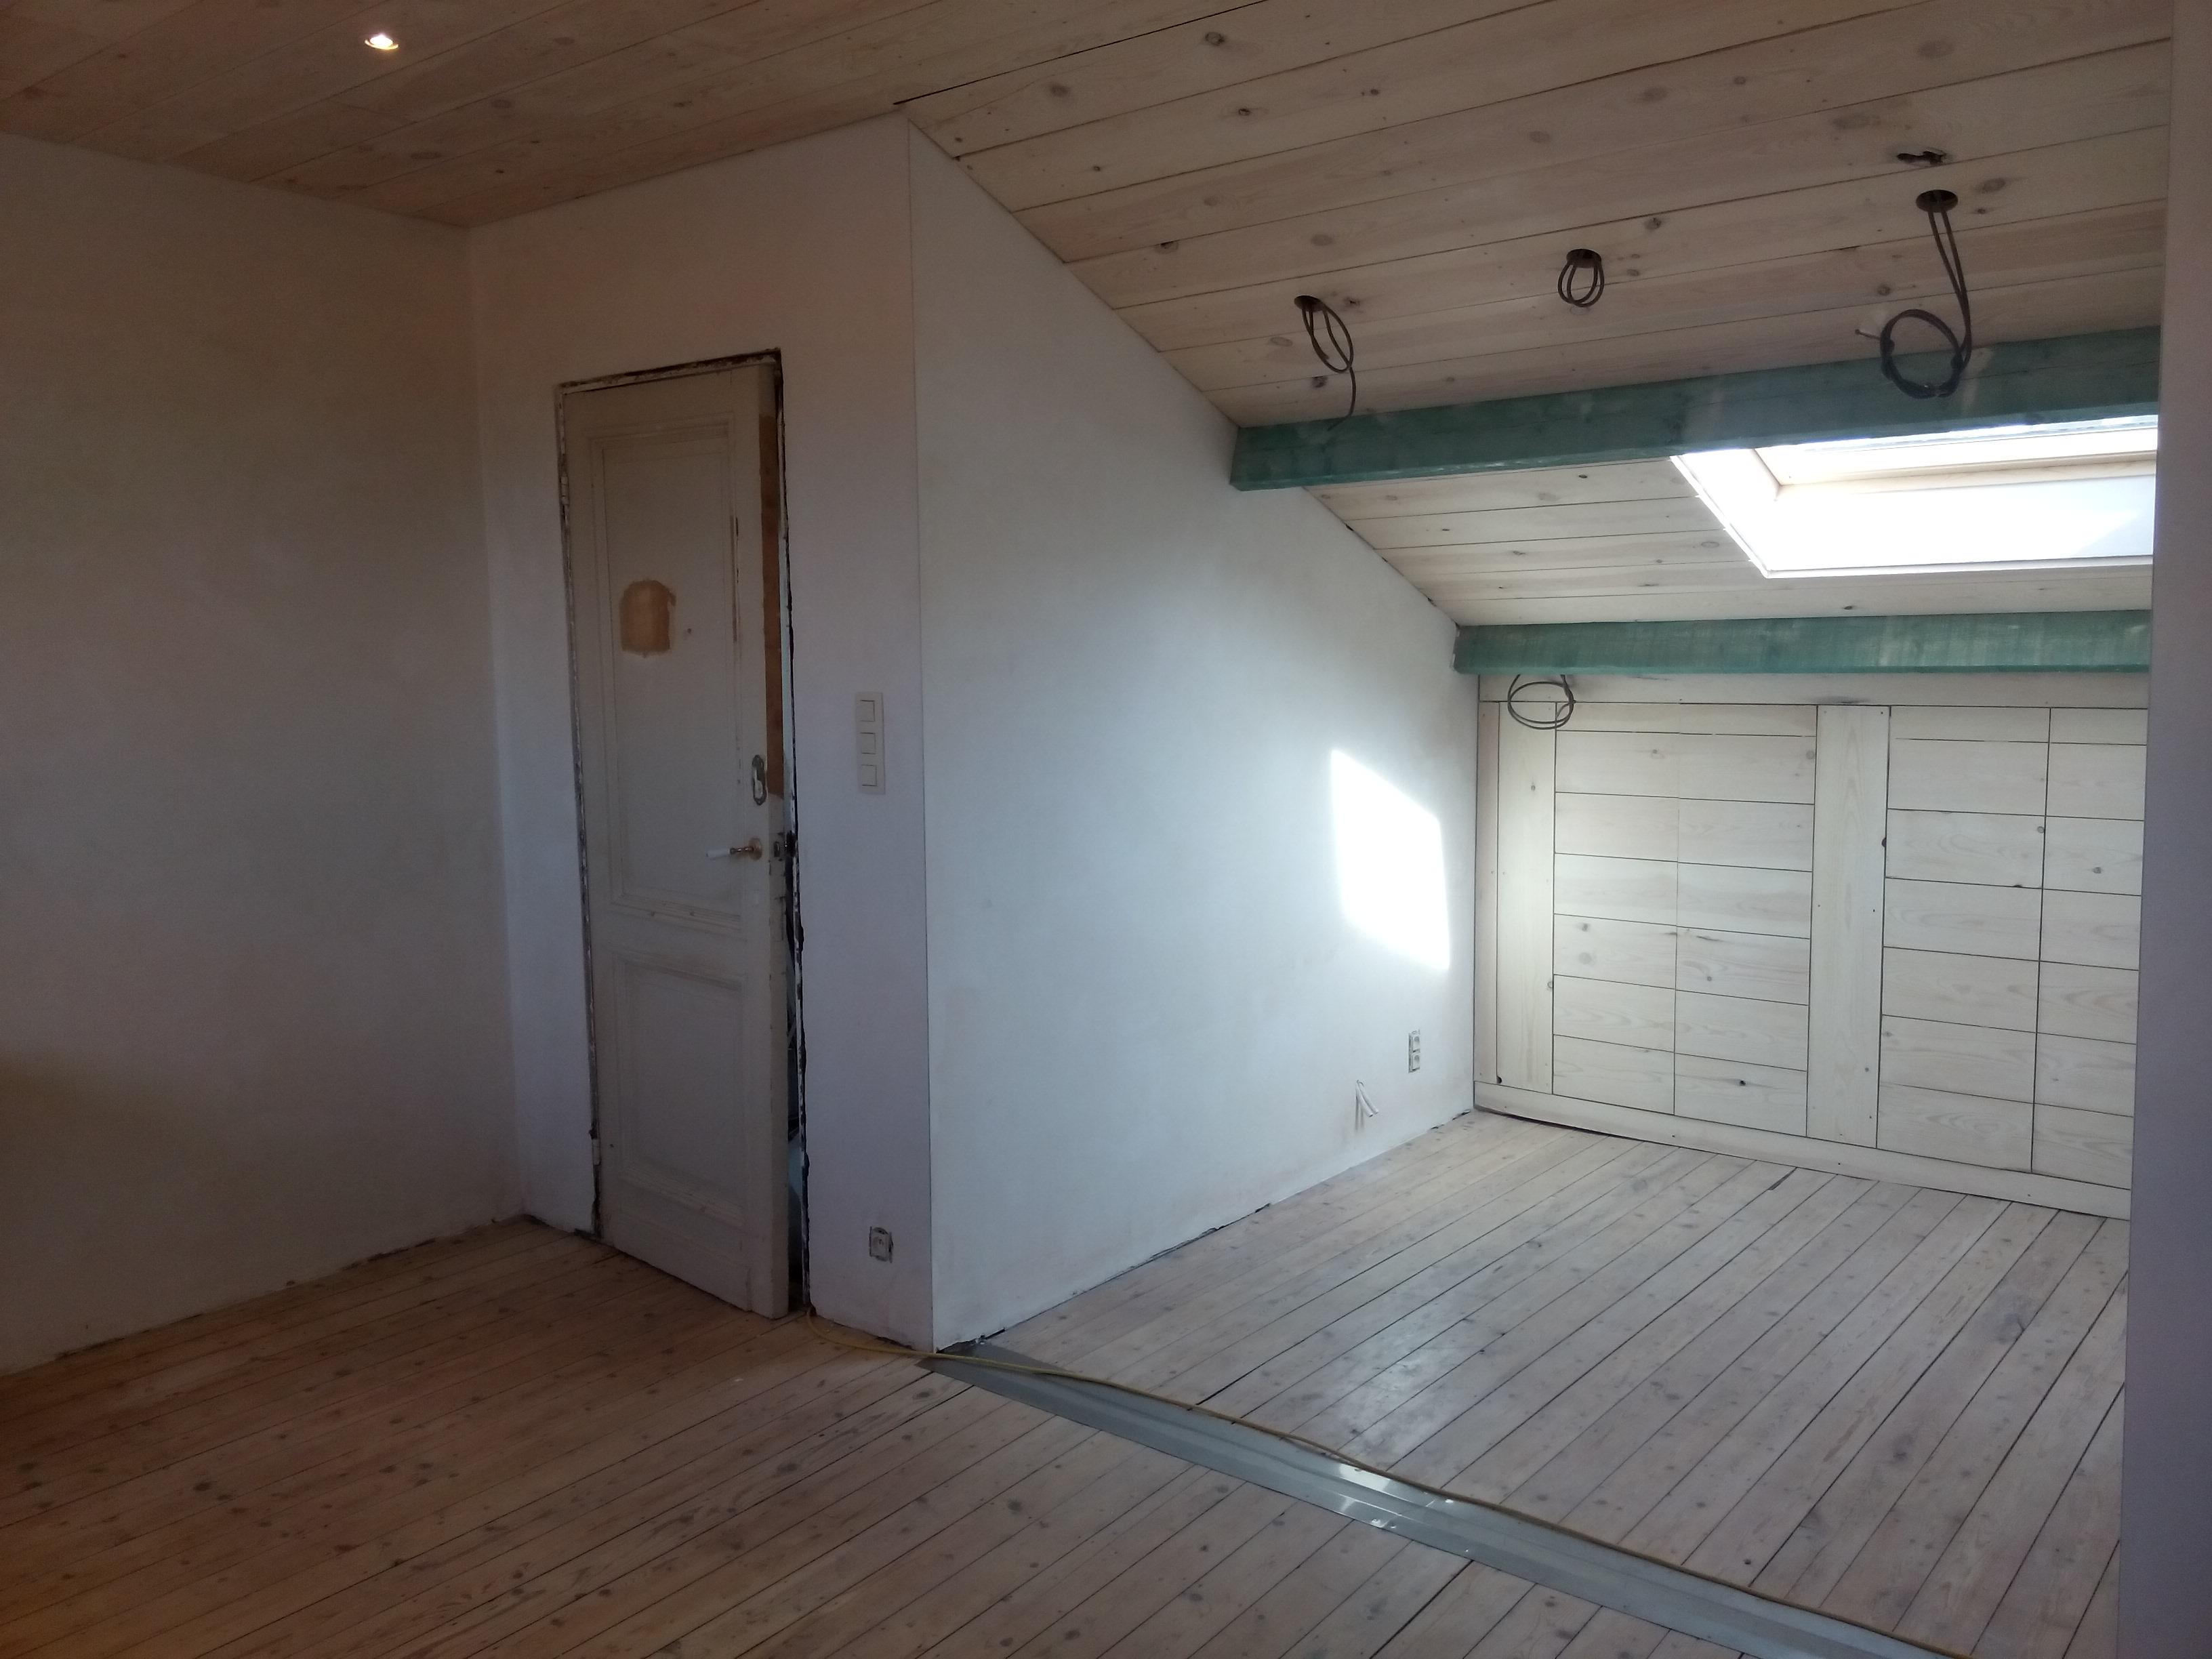 zolder oude kleine kamer